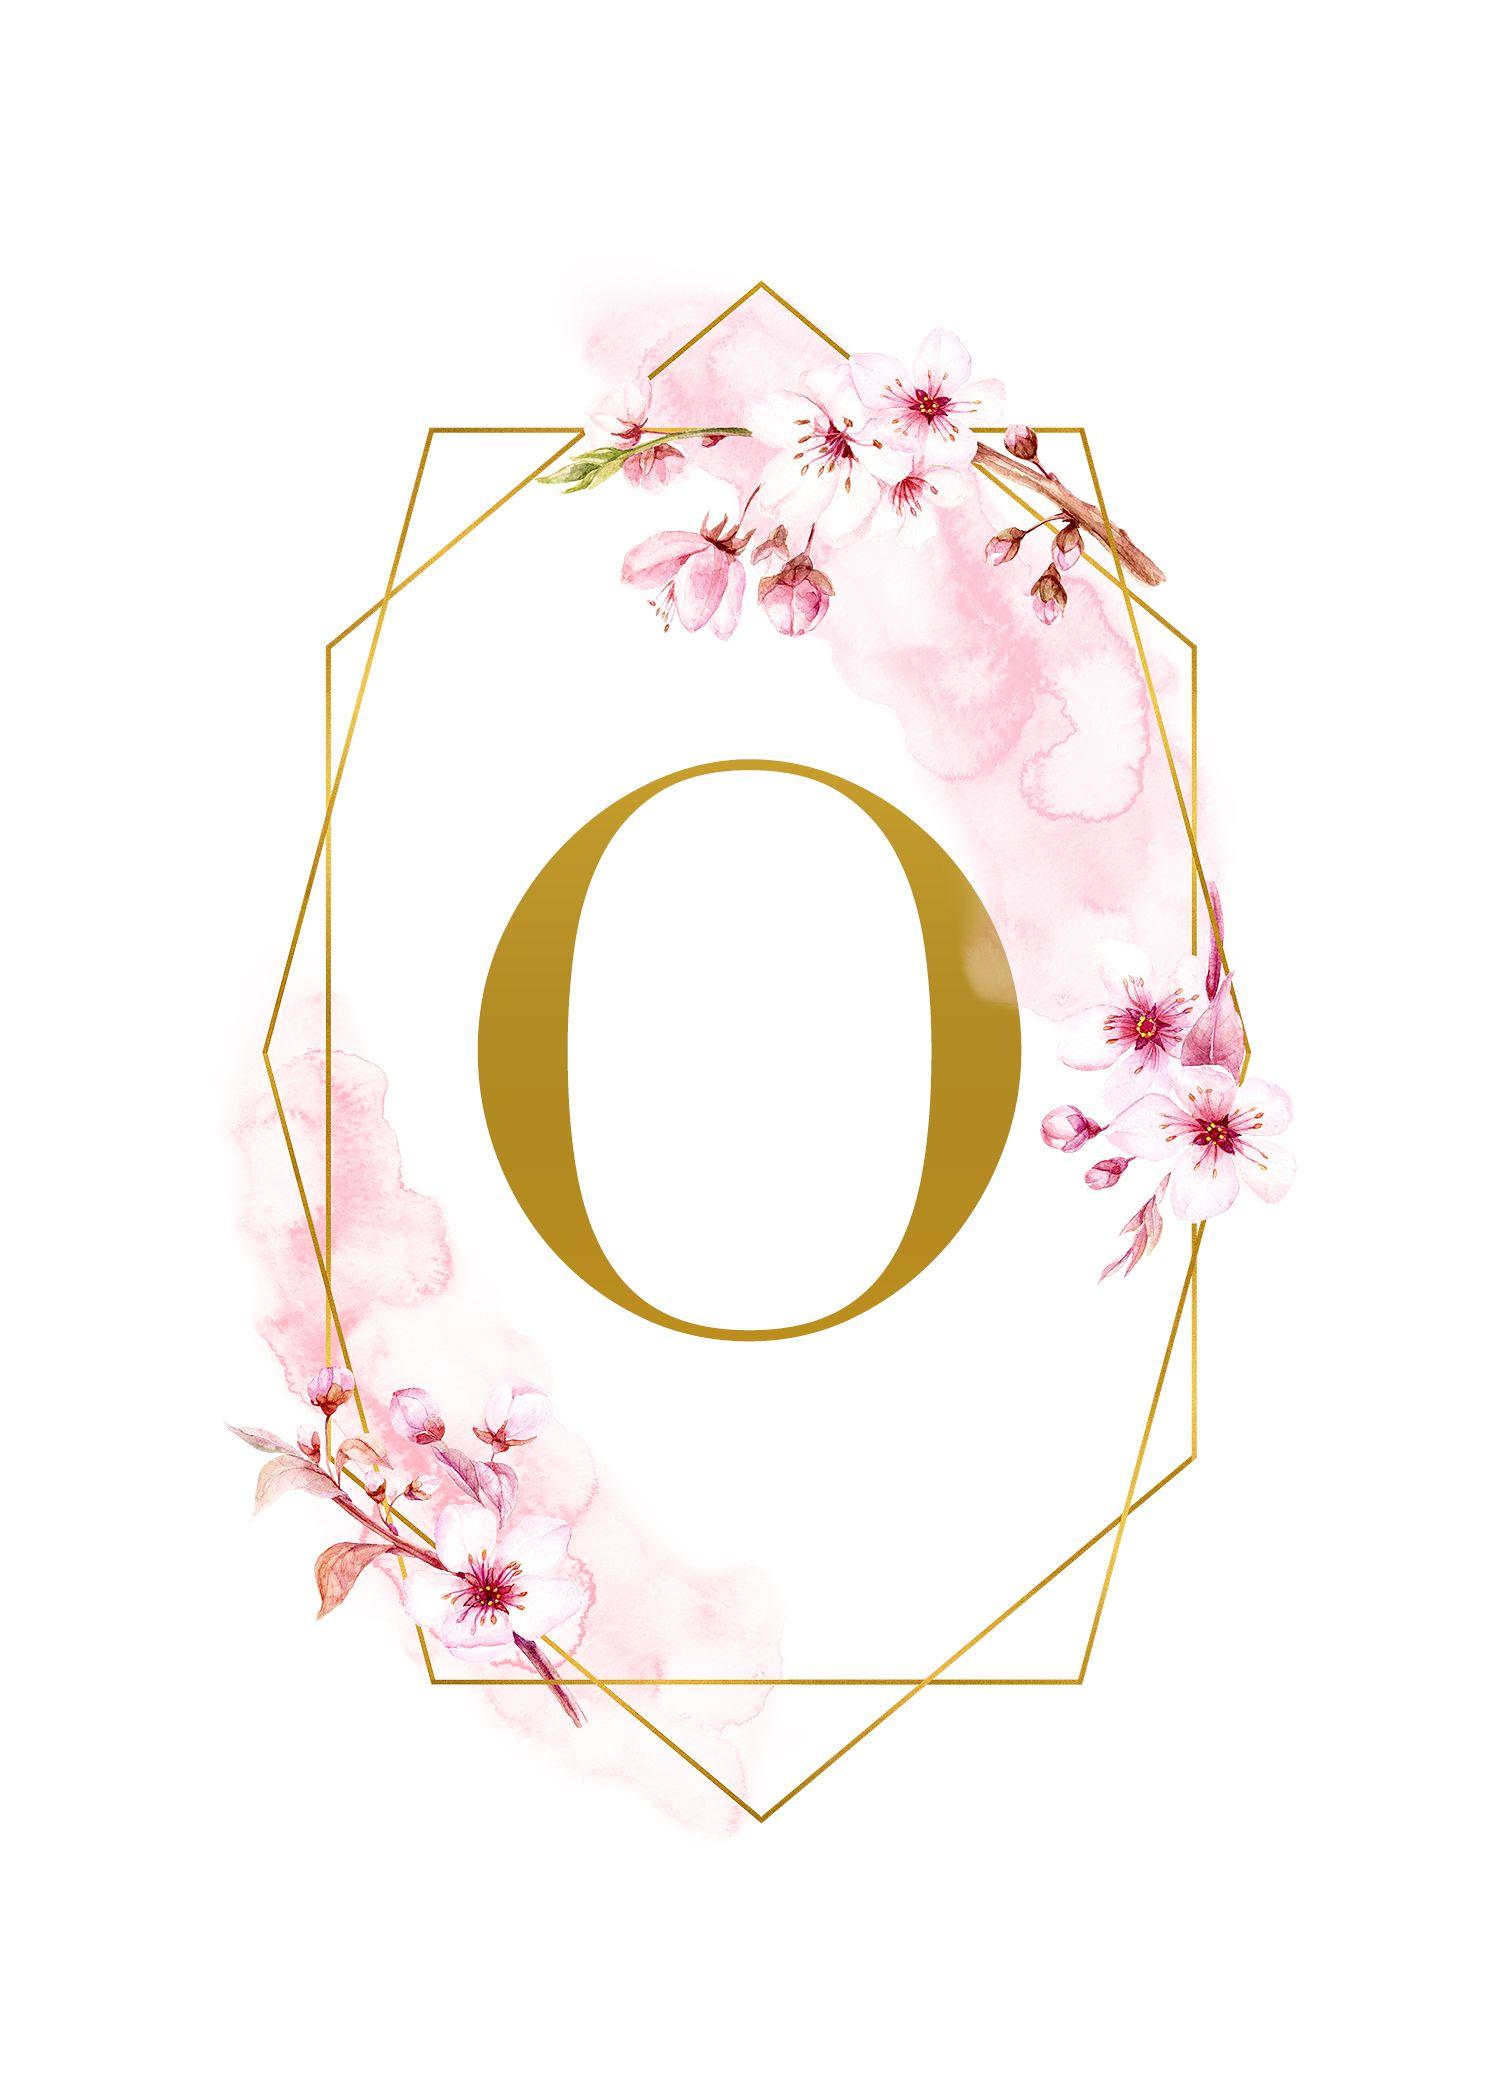 Pin De Karina Dalnichenko Em Pestanas Menina Anime Aniversario Anime